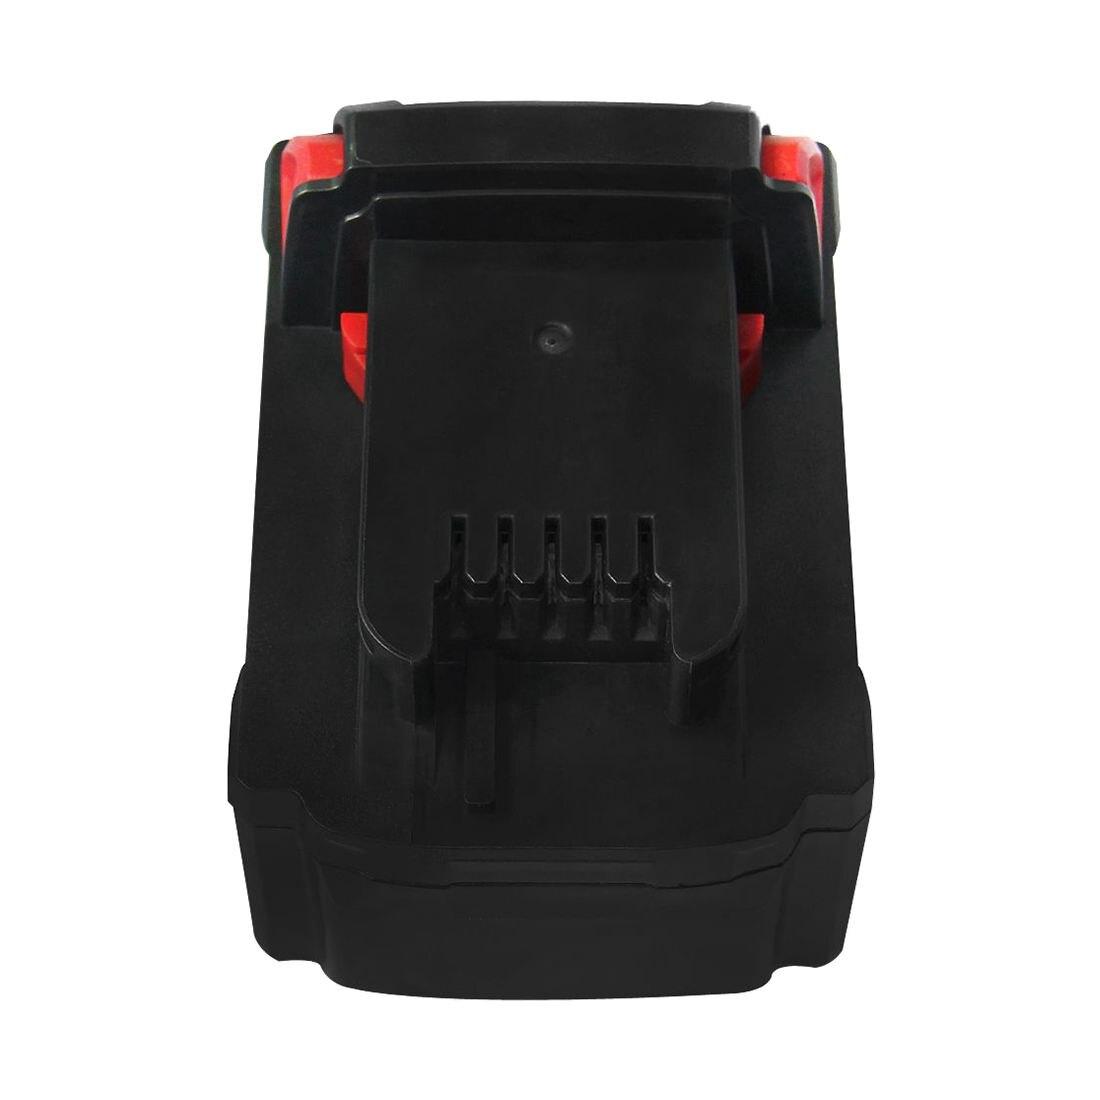 2pcs for Milwaukee 48-11-1828 M18 XC LITHIUM Li-ion Fuel Battery Pack 4.0Ah 18V